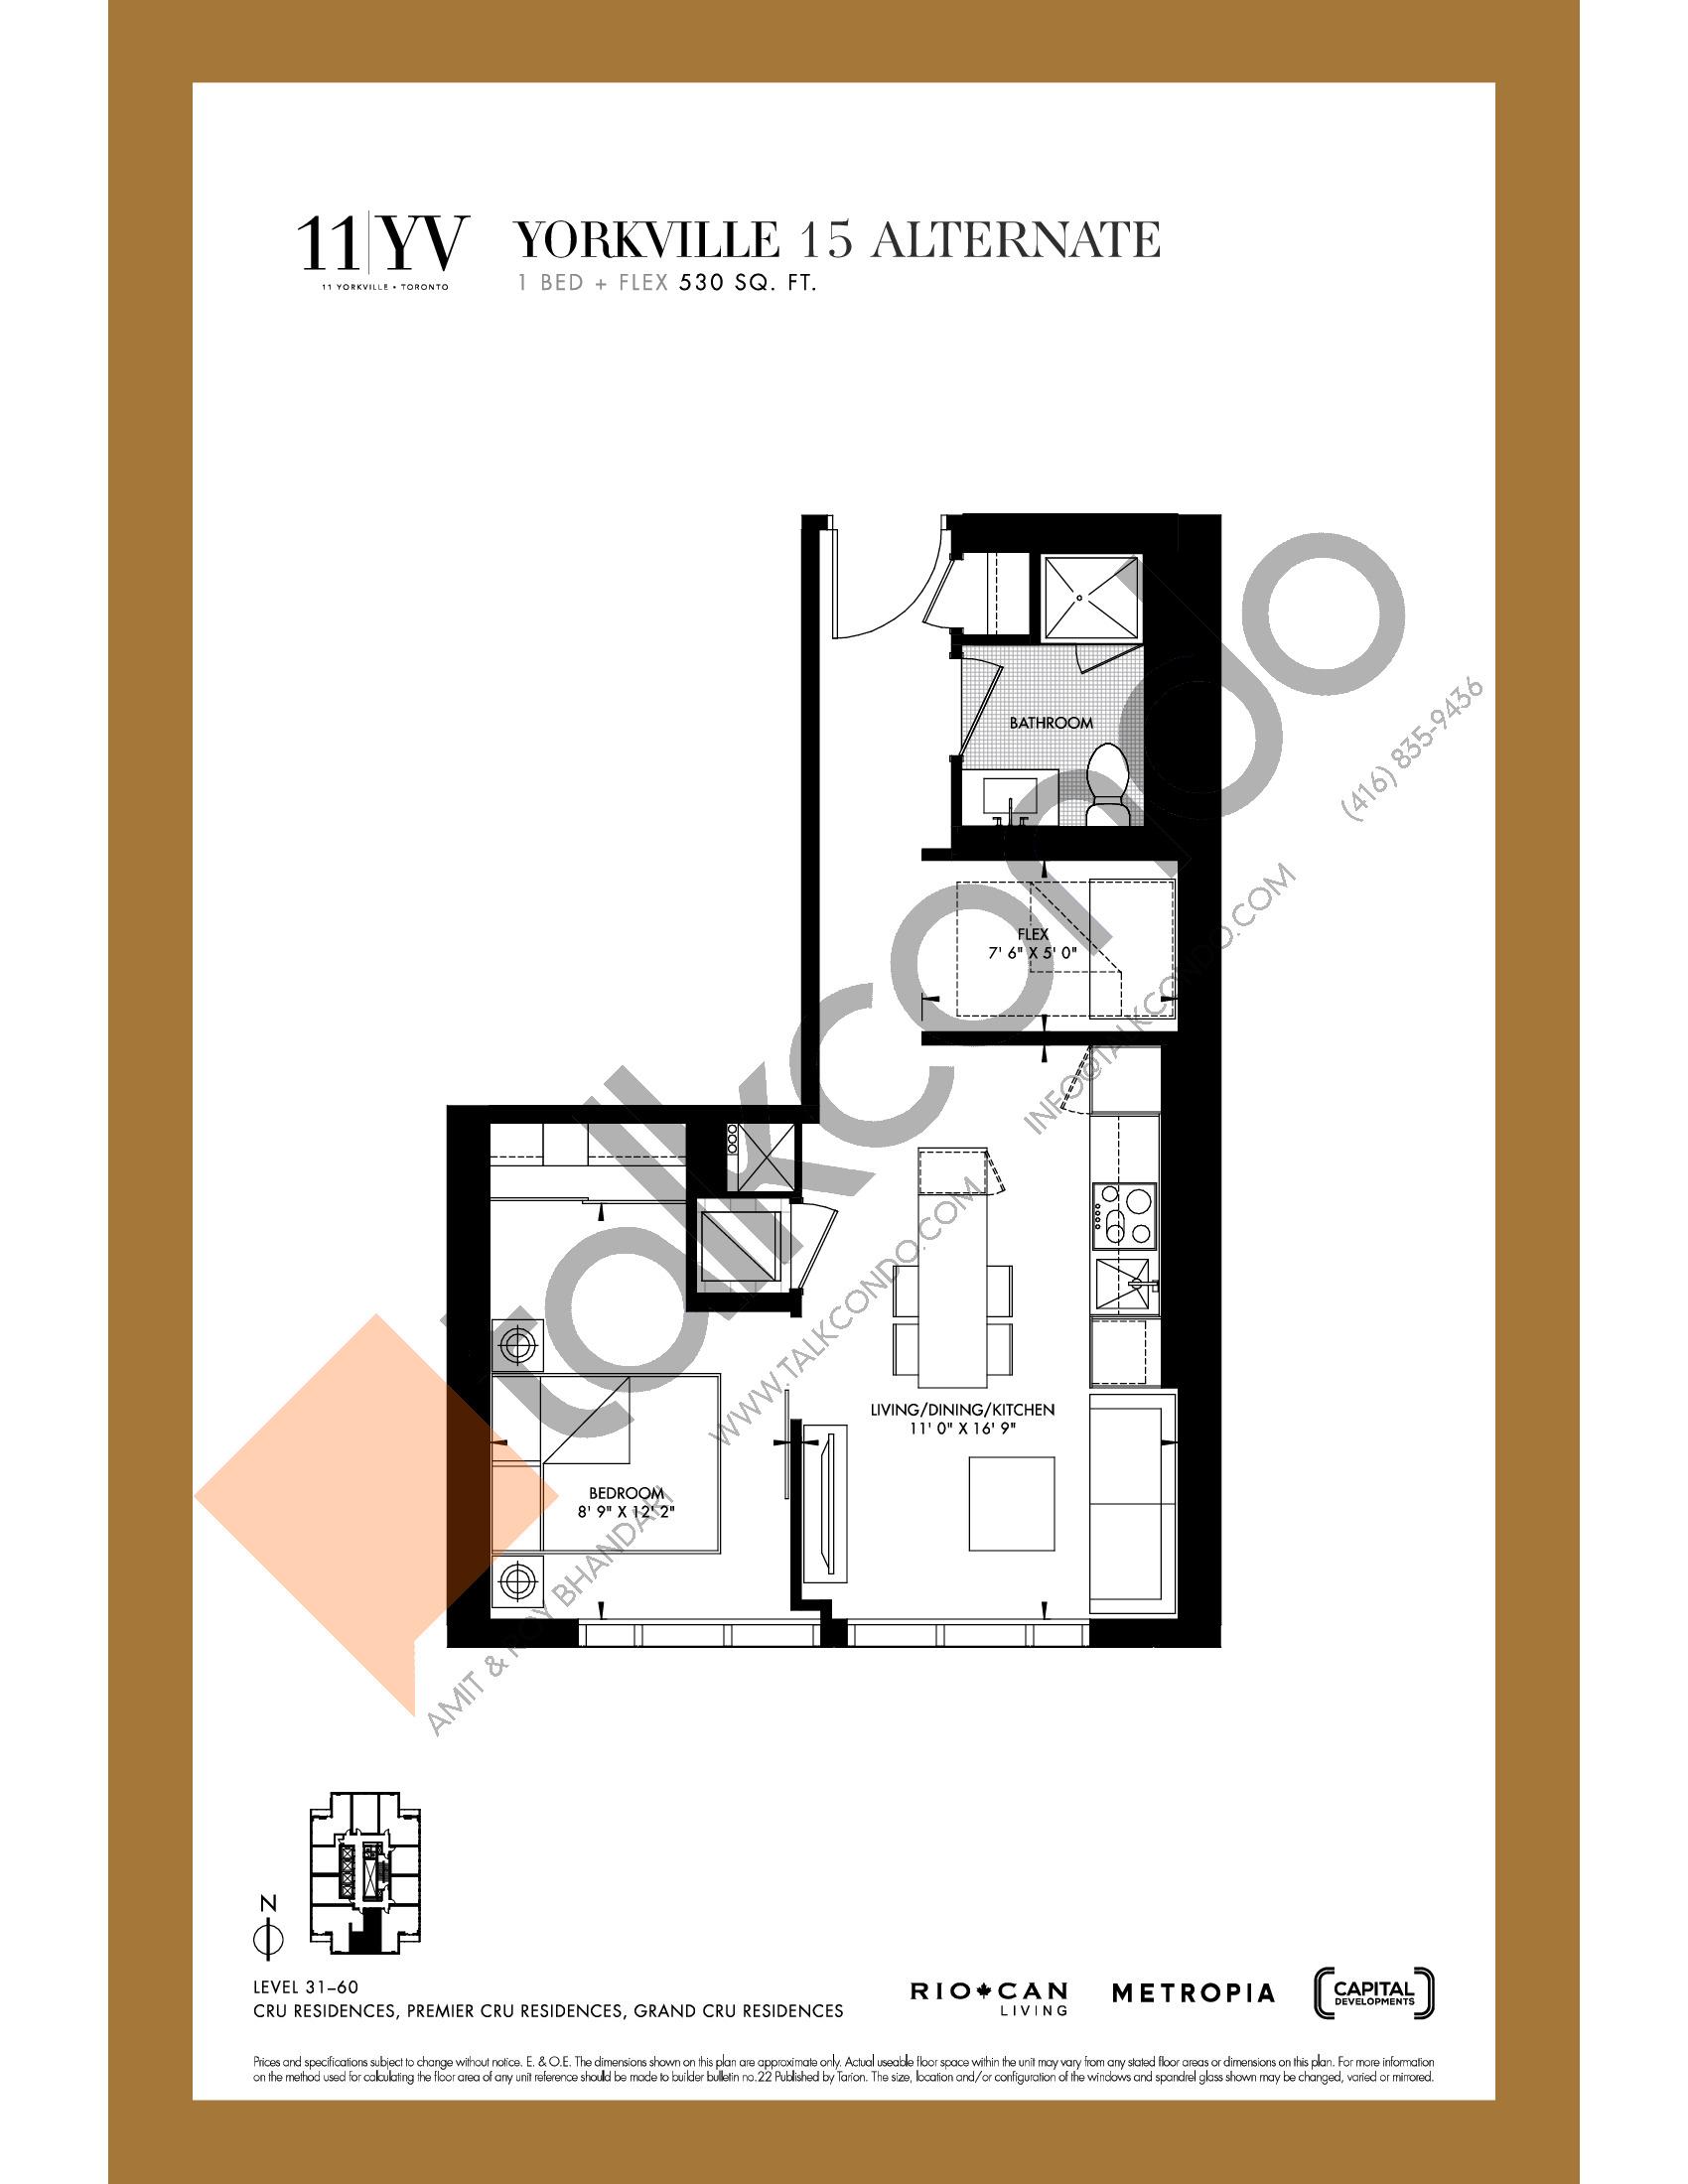 Yorkville 15 Alternate Floor Plan at 11YV Condos - 530 sq.ft